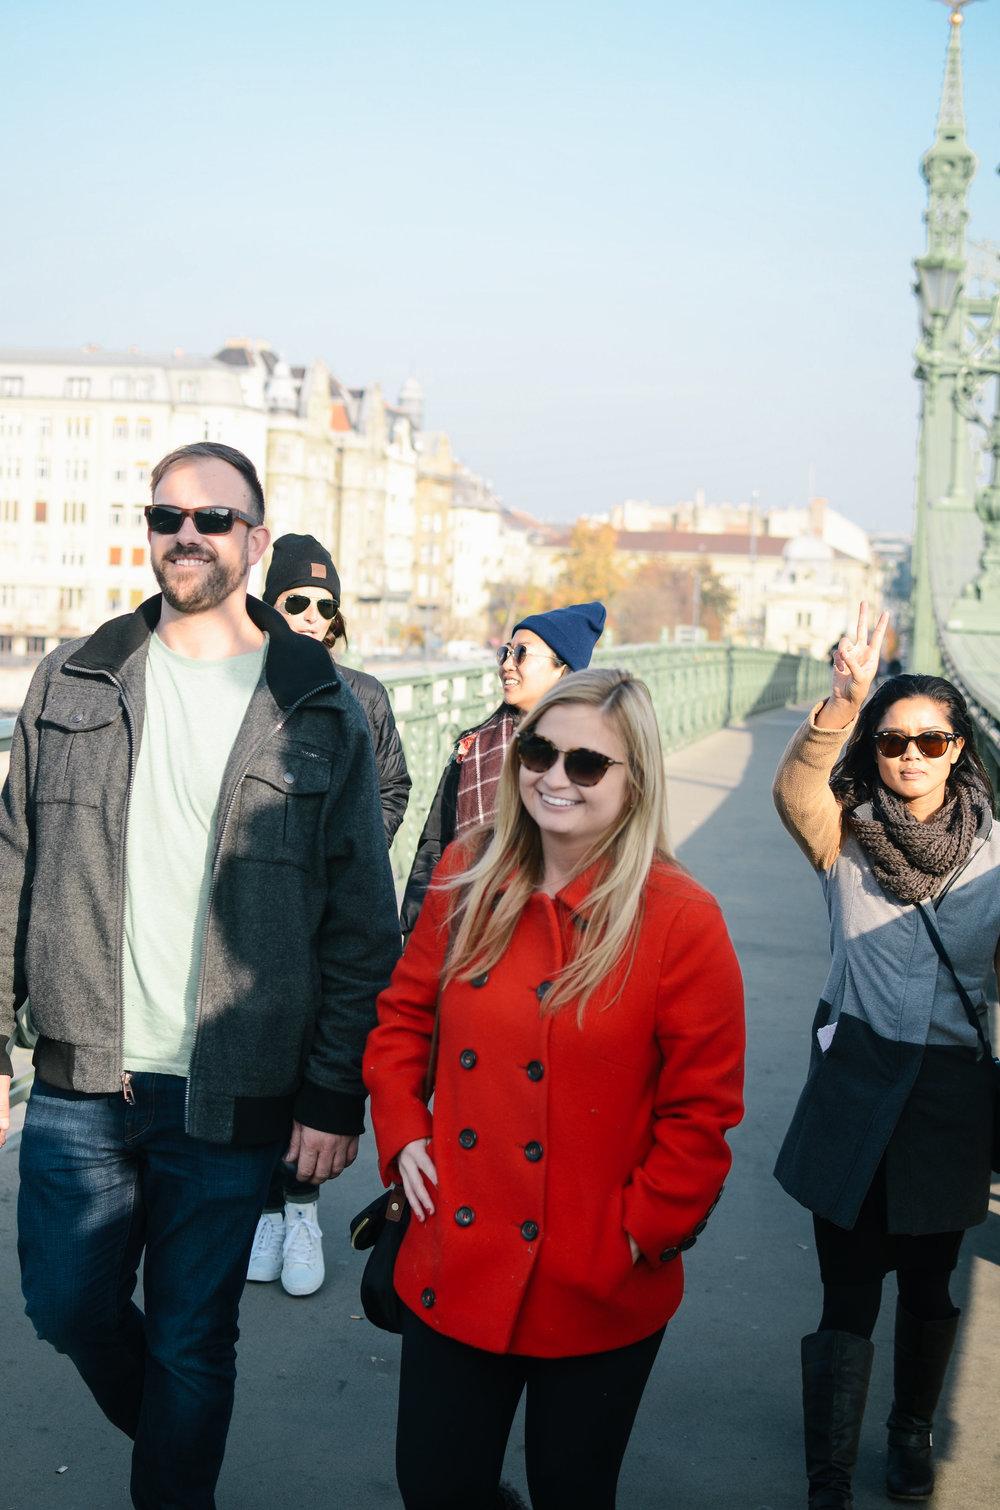 budapest-hungary-travel-guide-lifeonpine_DSC_0506.jpg